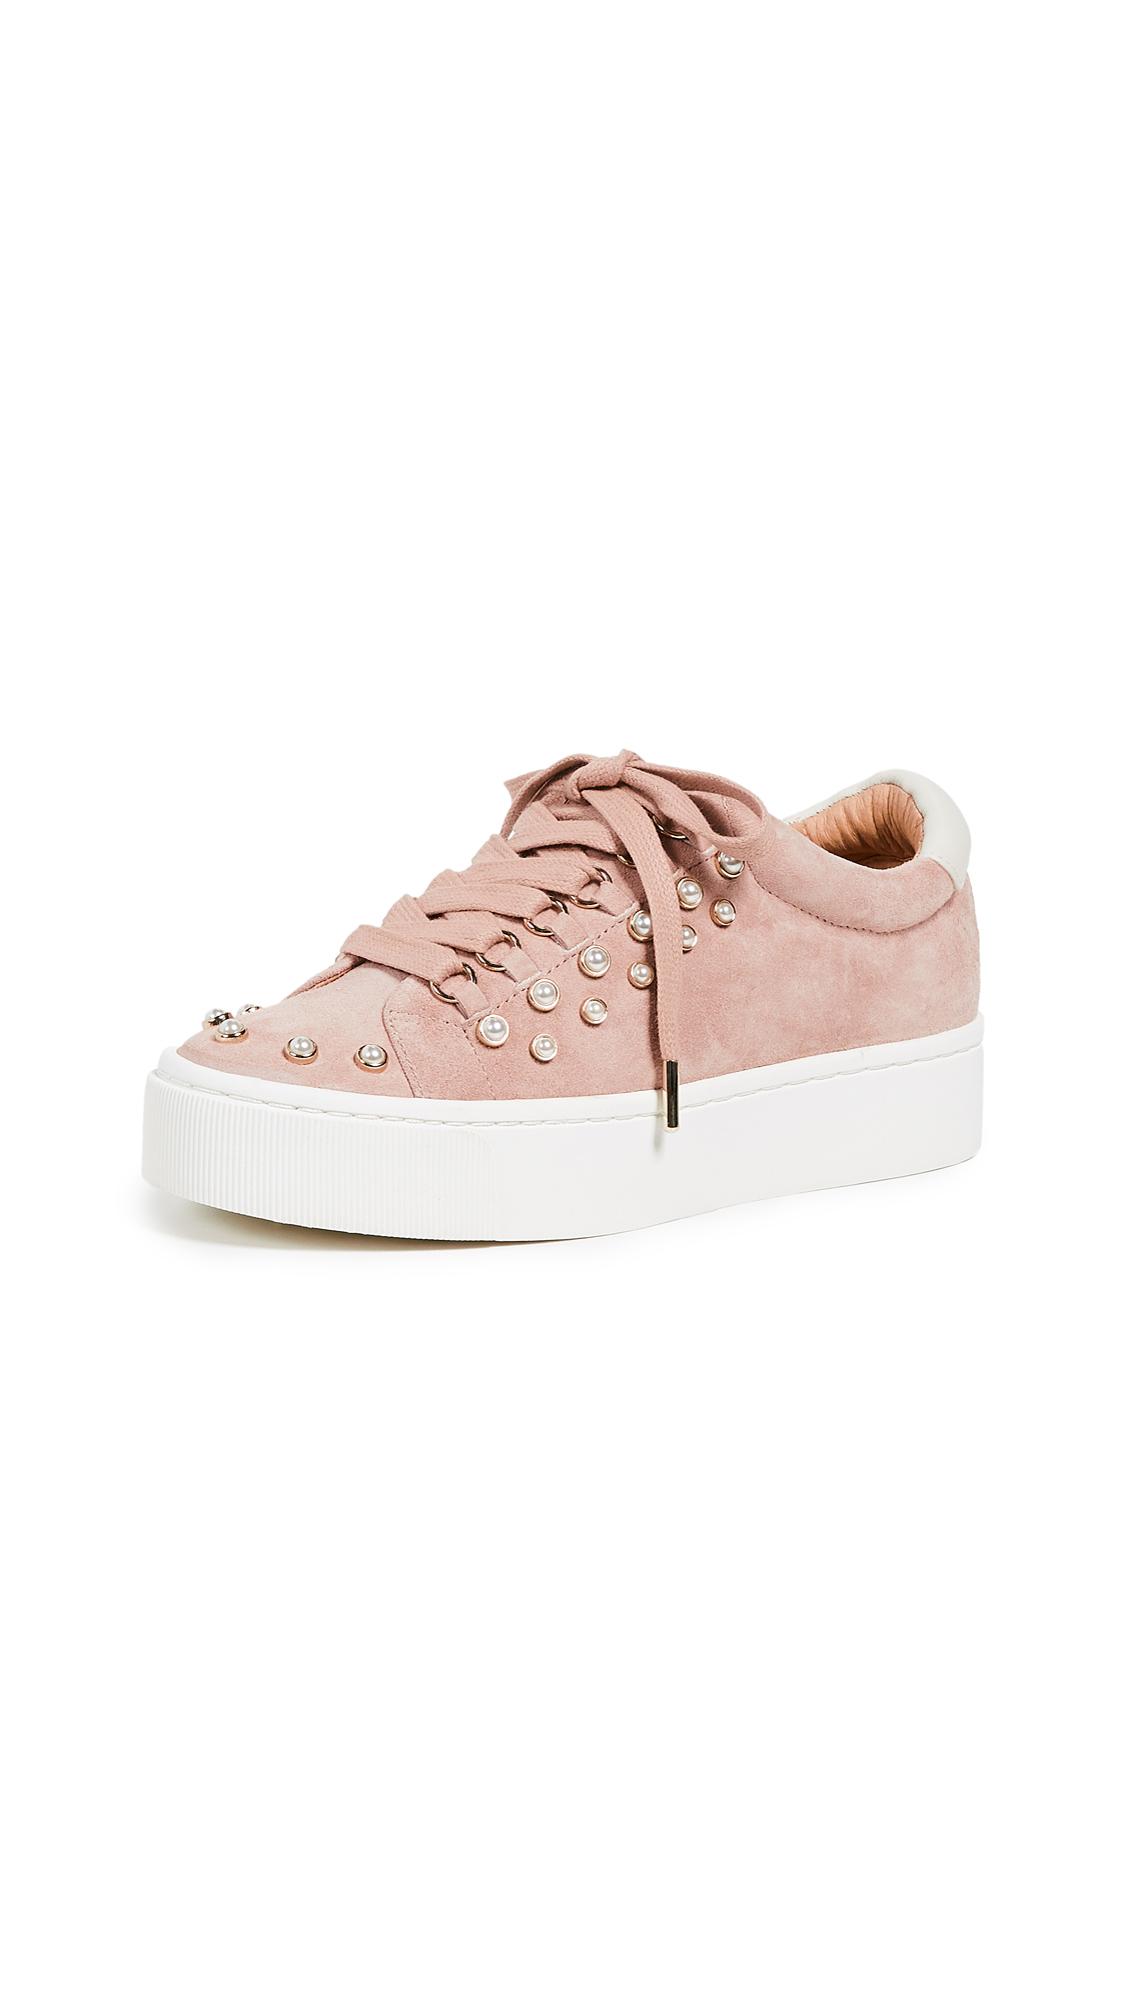 Joie Handan Sneakers - Peach